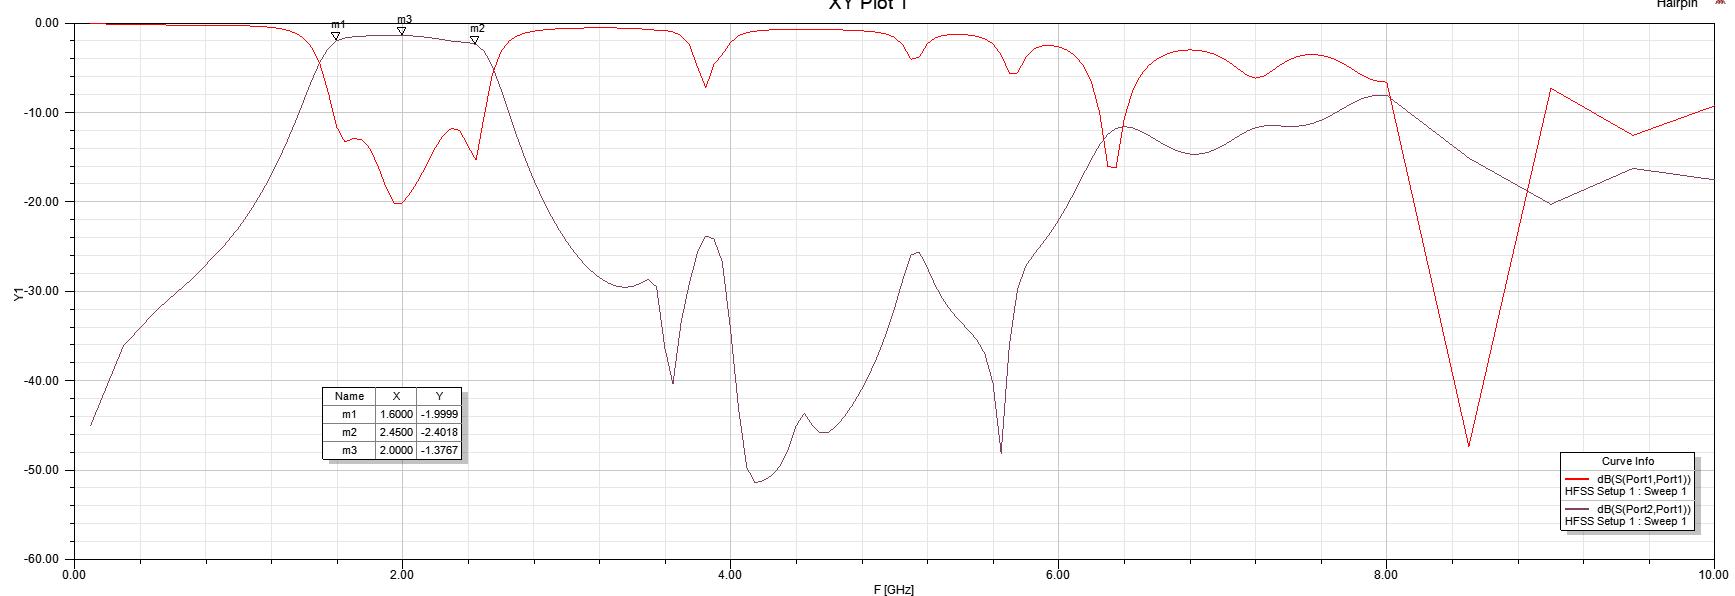 DSNRxR/LNA/hairpin_2GHz/V2/SIM_S21_S11.PNG